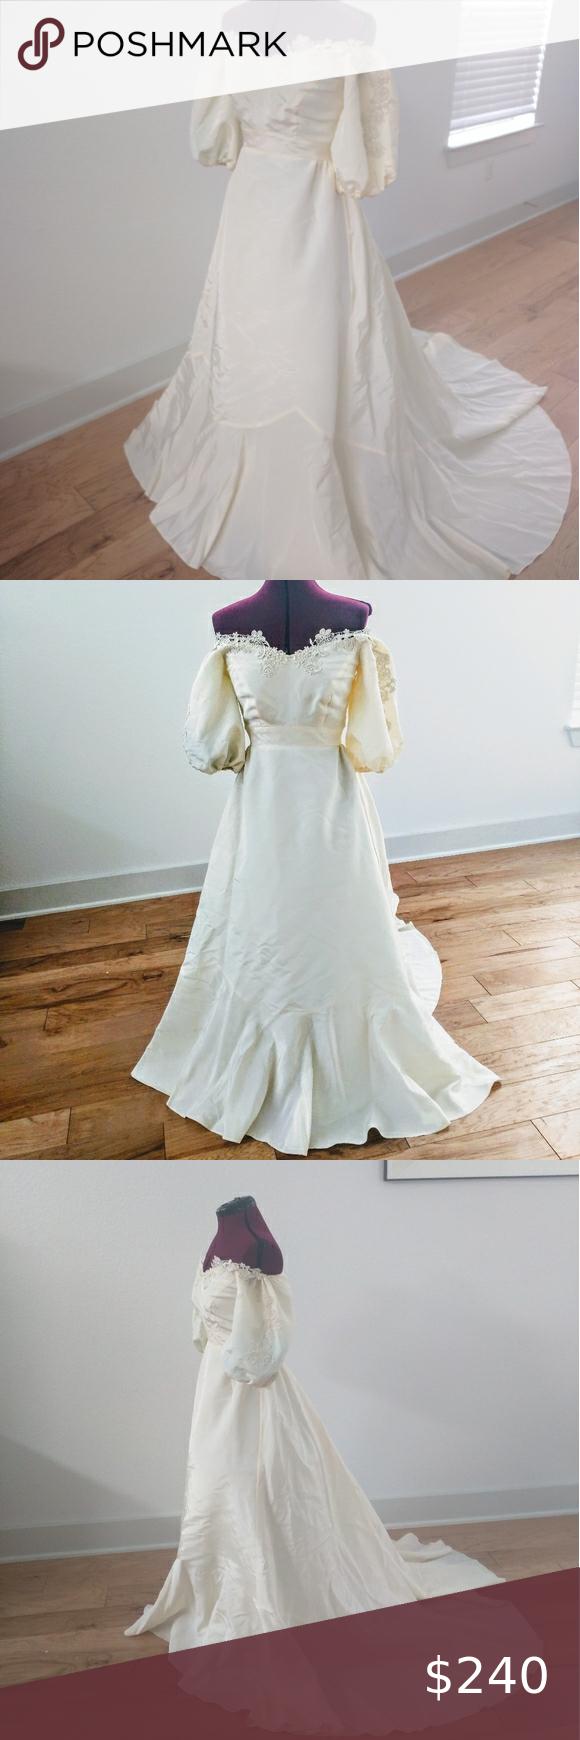 Stunning Victorian Style Wedding Dress Victorian Style Wedding Dress Victorian Style Wedding Wedding Dresses [ 1740 x 580 Pixel ]